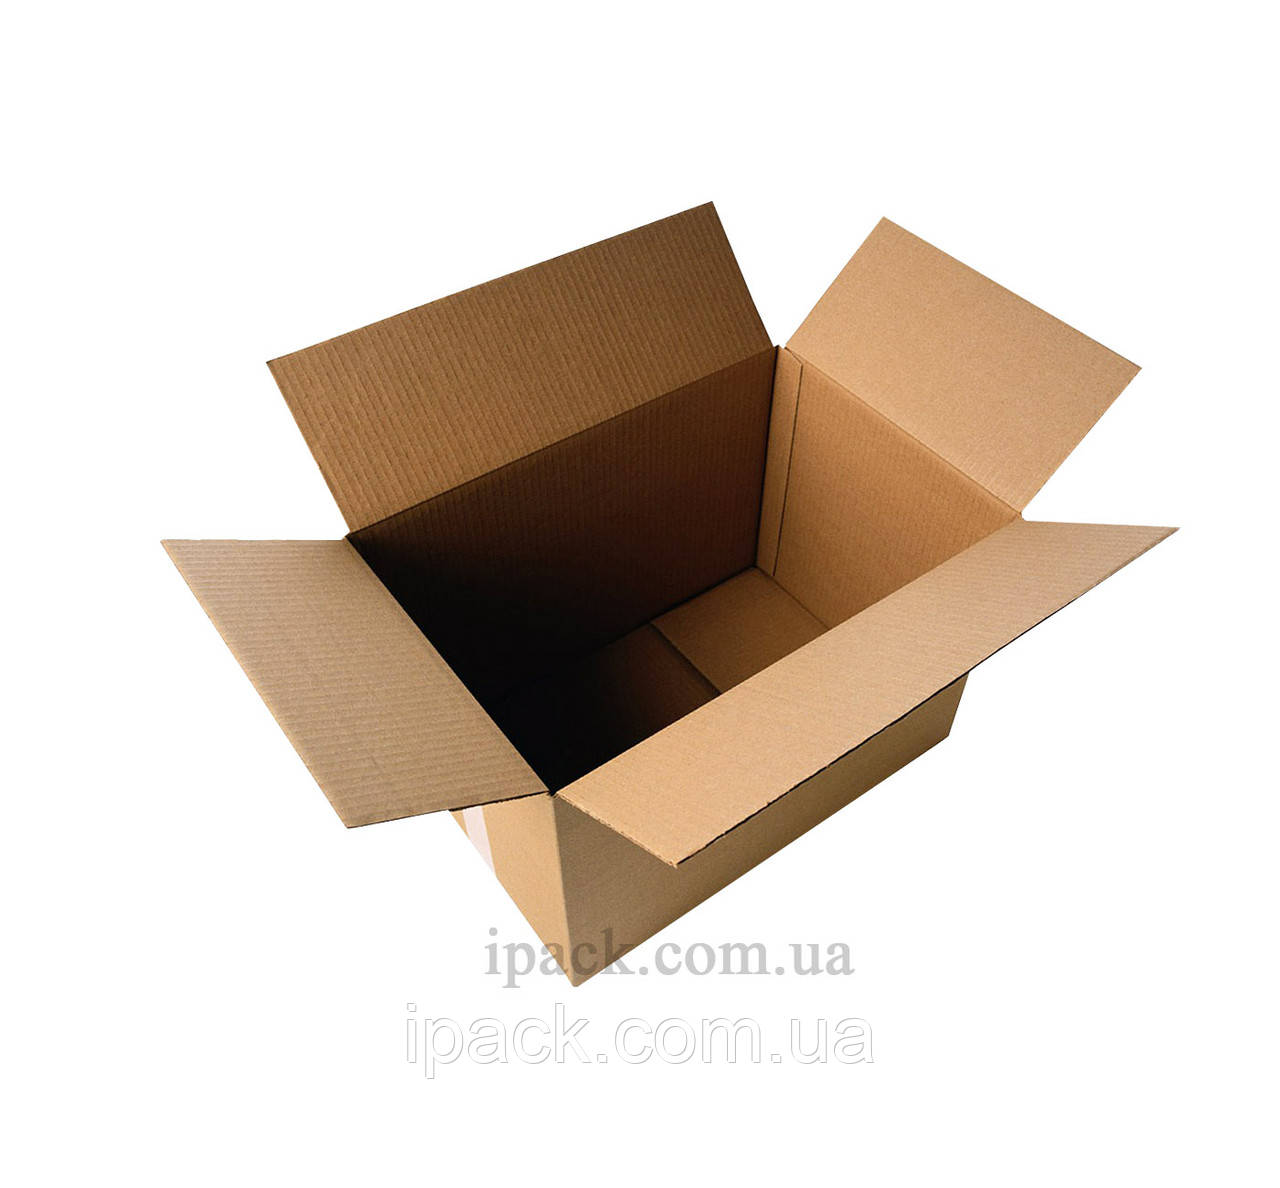 Гофроящик 265*248*145 мм, бурый, четырехклапанный картонный короб